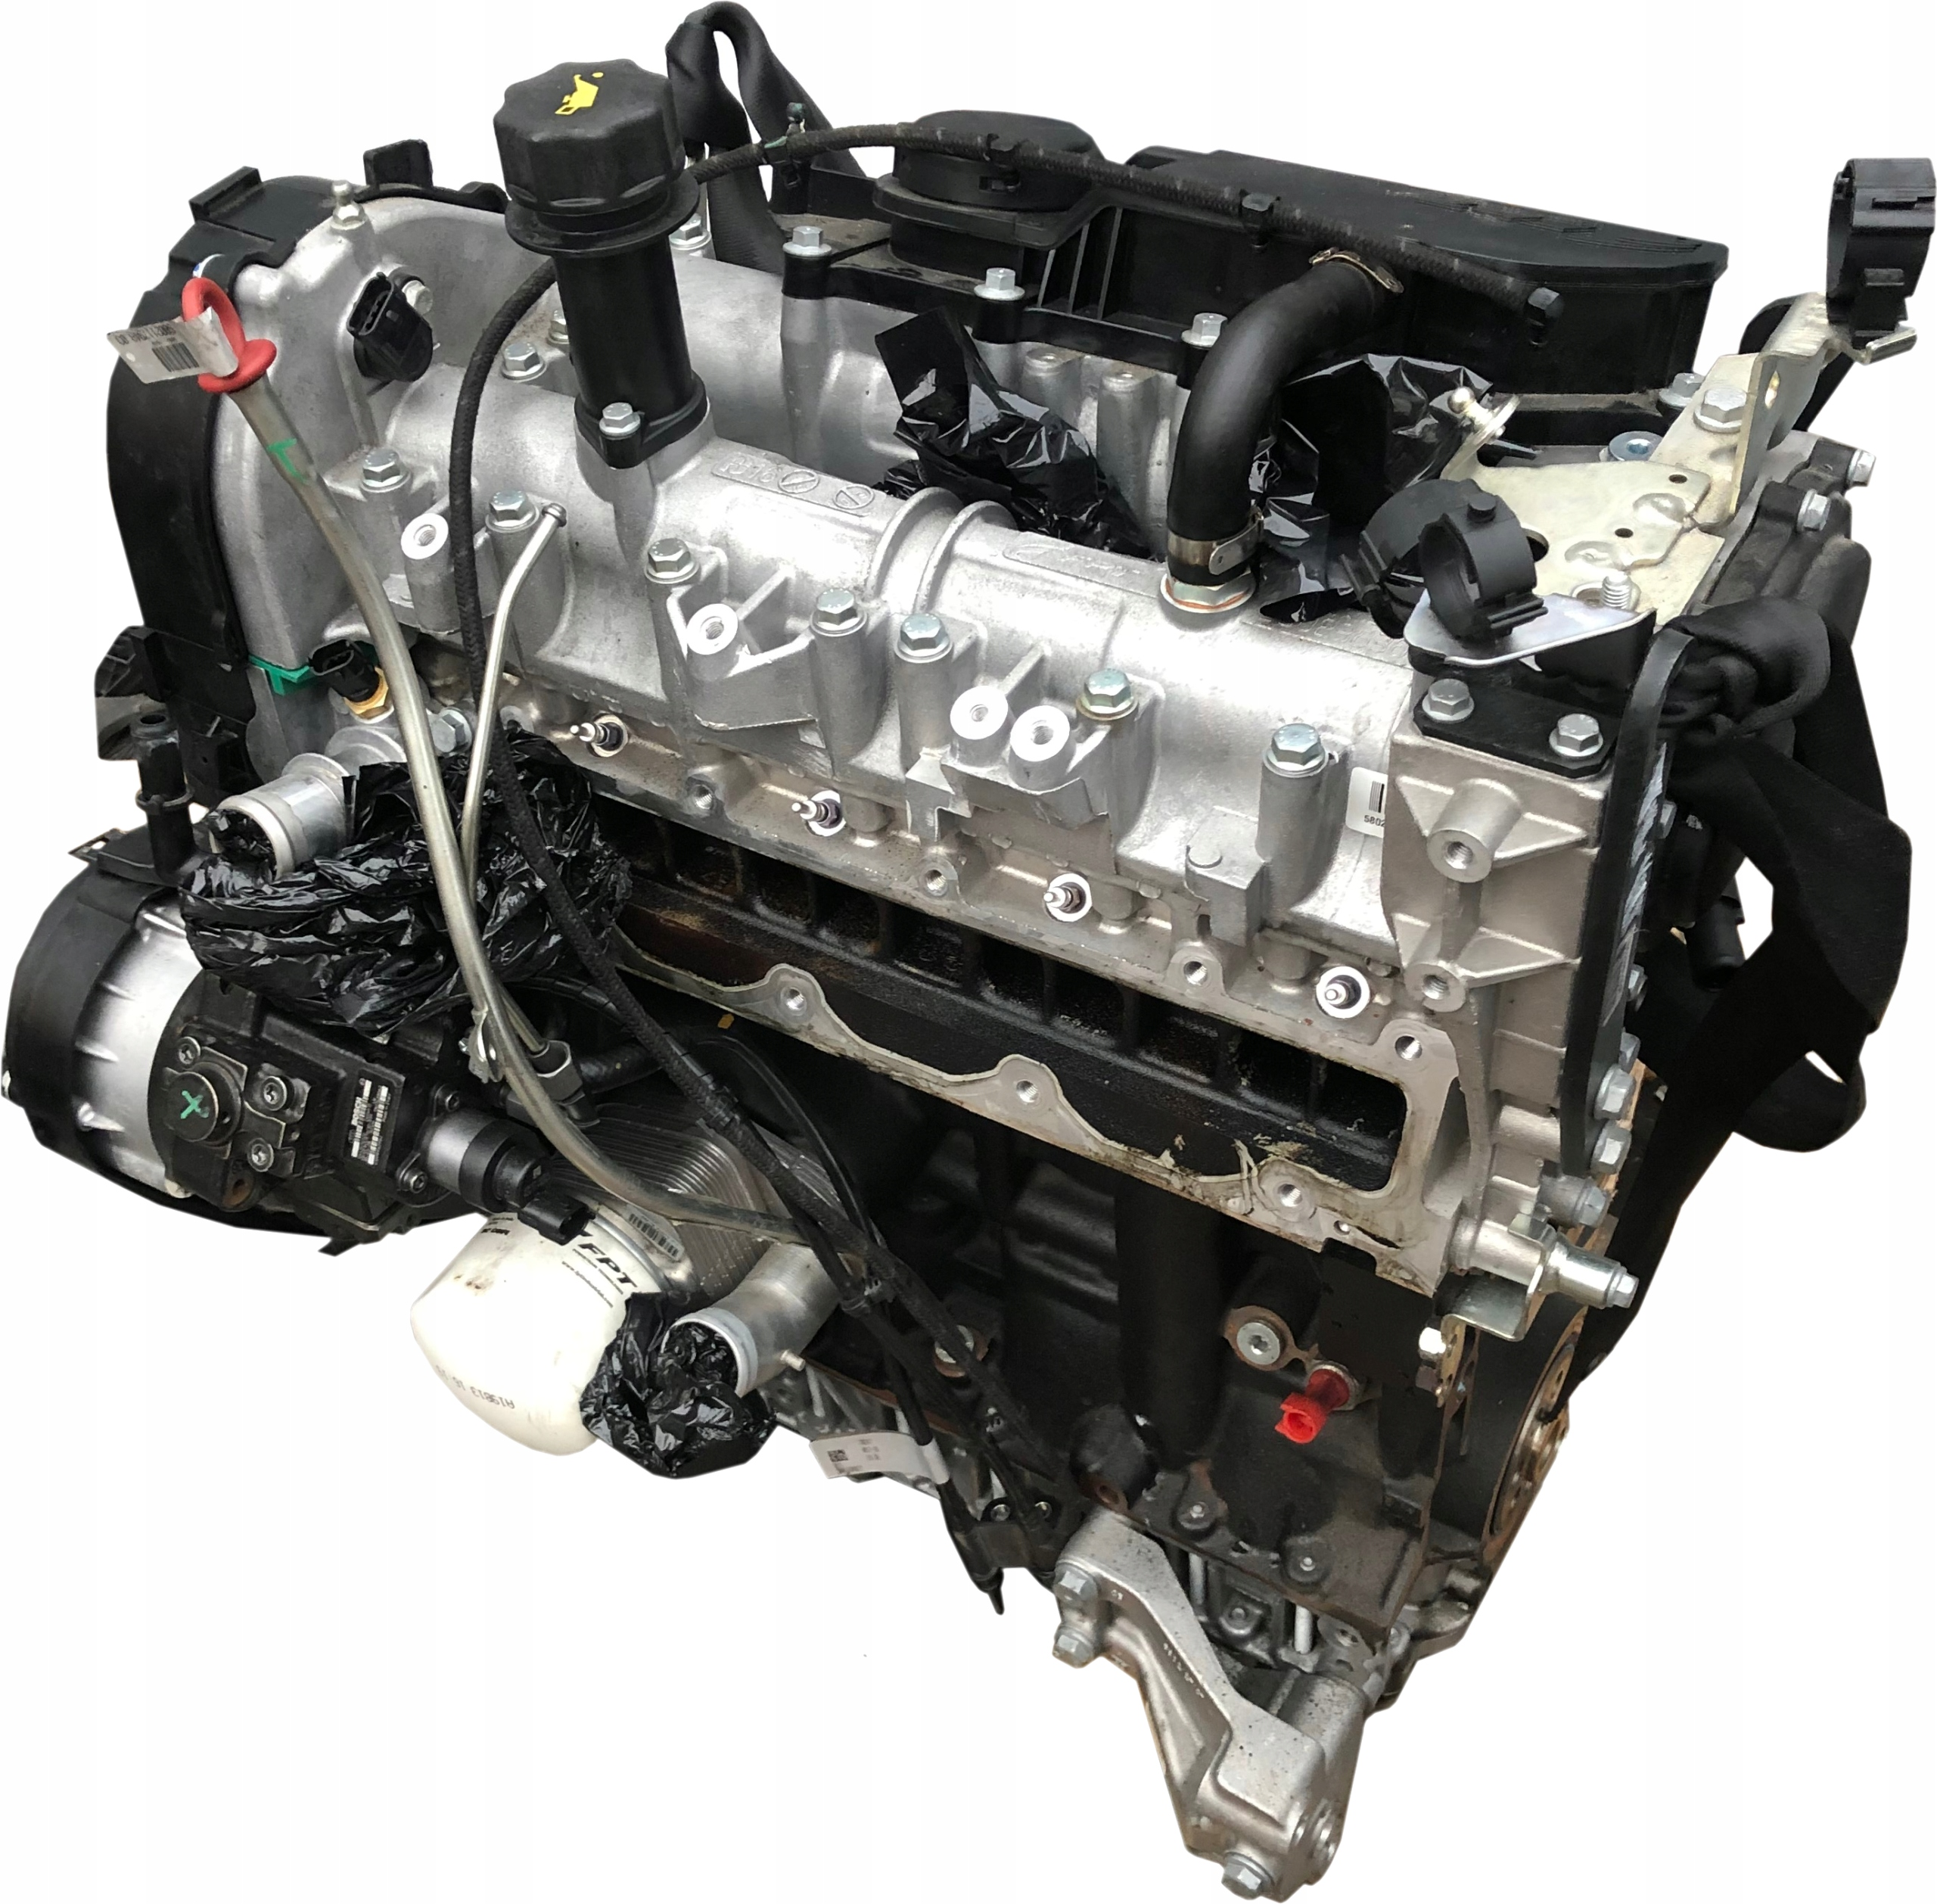 fiat ducato 23 евро 6 двигатель столбик головка вал